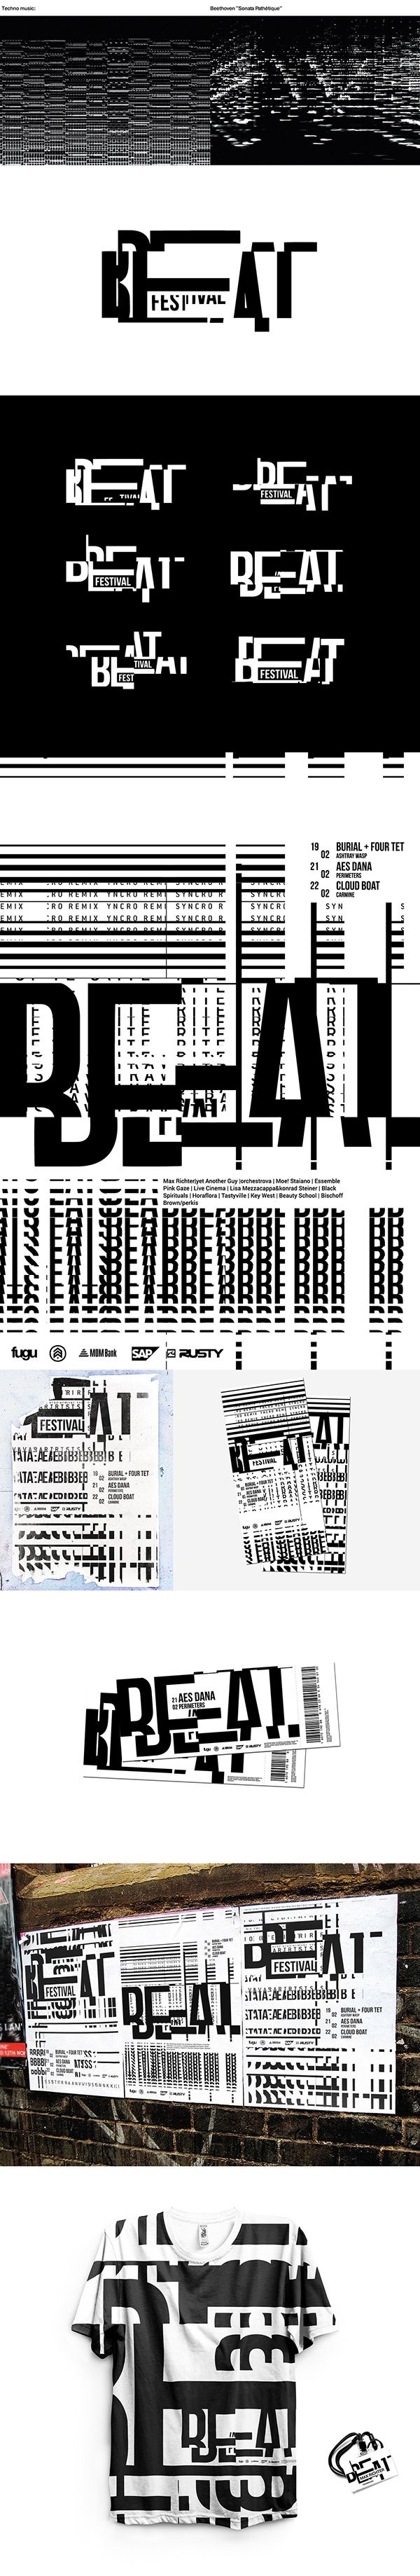 Beat Festival   Brand identity on Behance